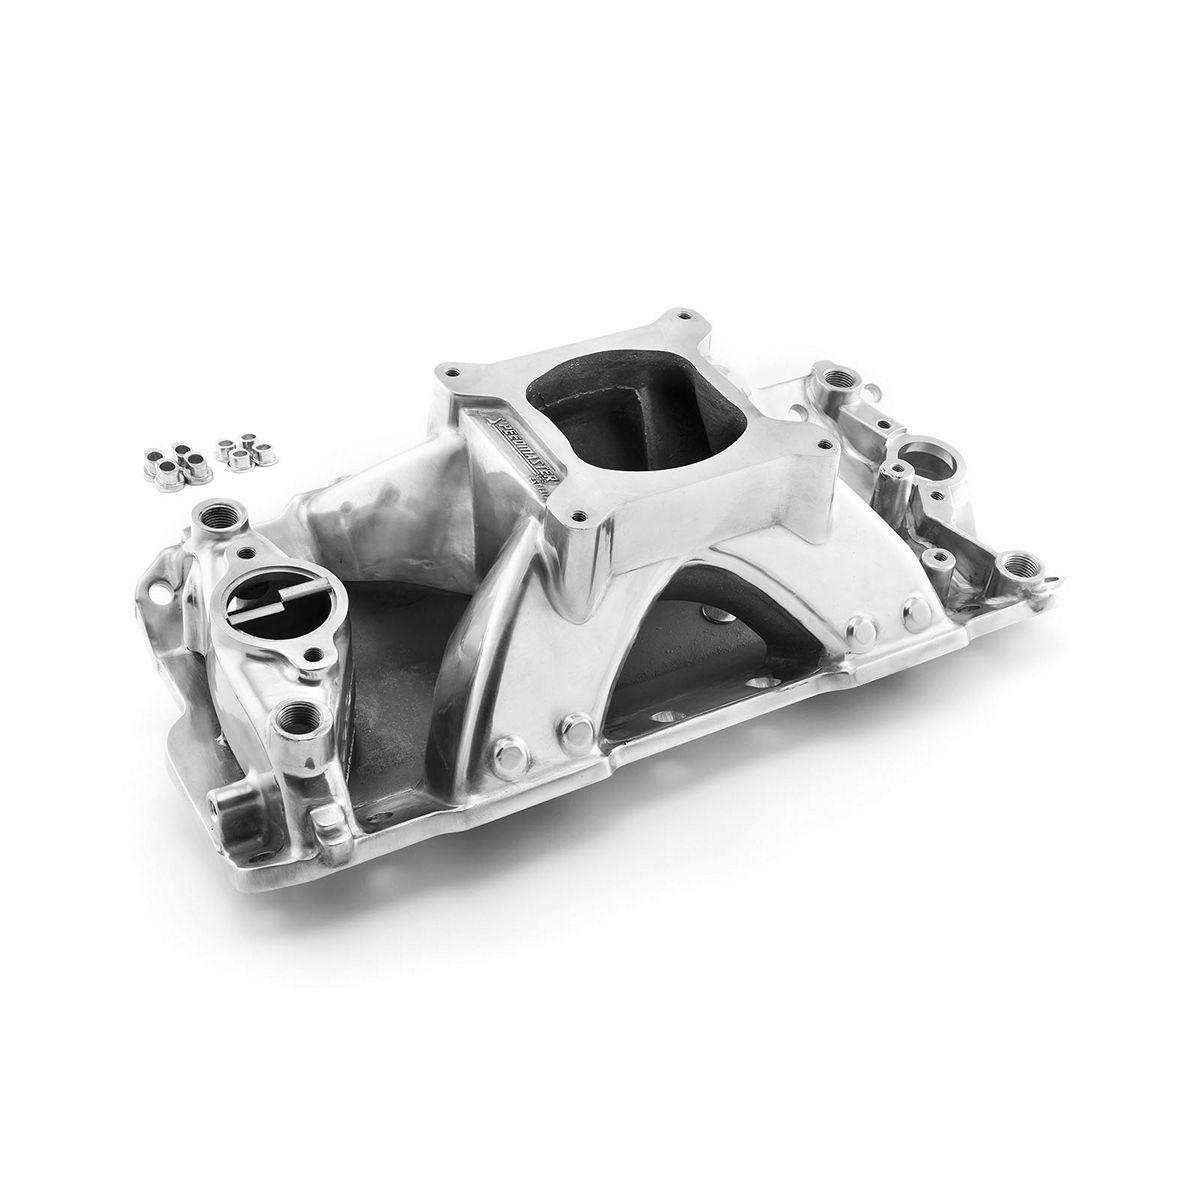 Speedmaster 1-147-014 Intake Manifold, HiRise, Square Bore, Single Plane, Aluminum, Polished, Small Block Chevy, Each